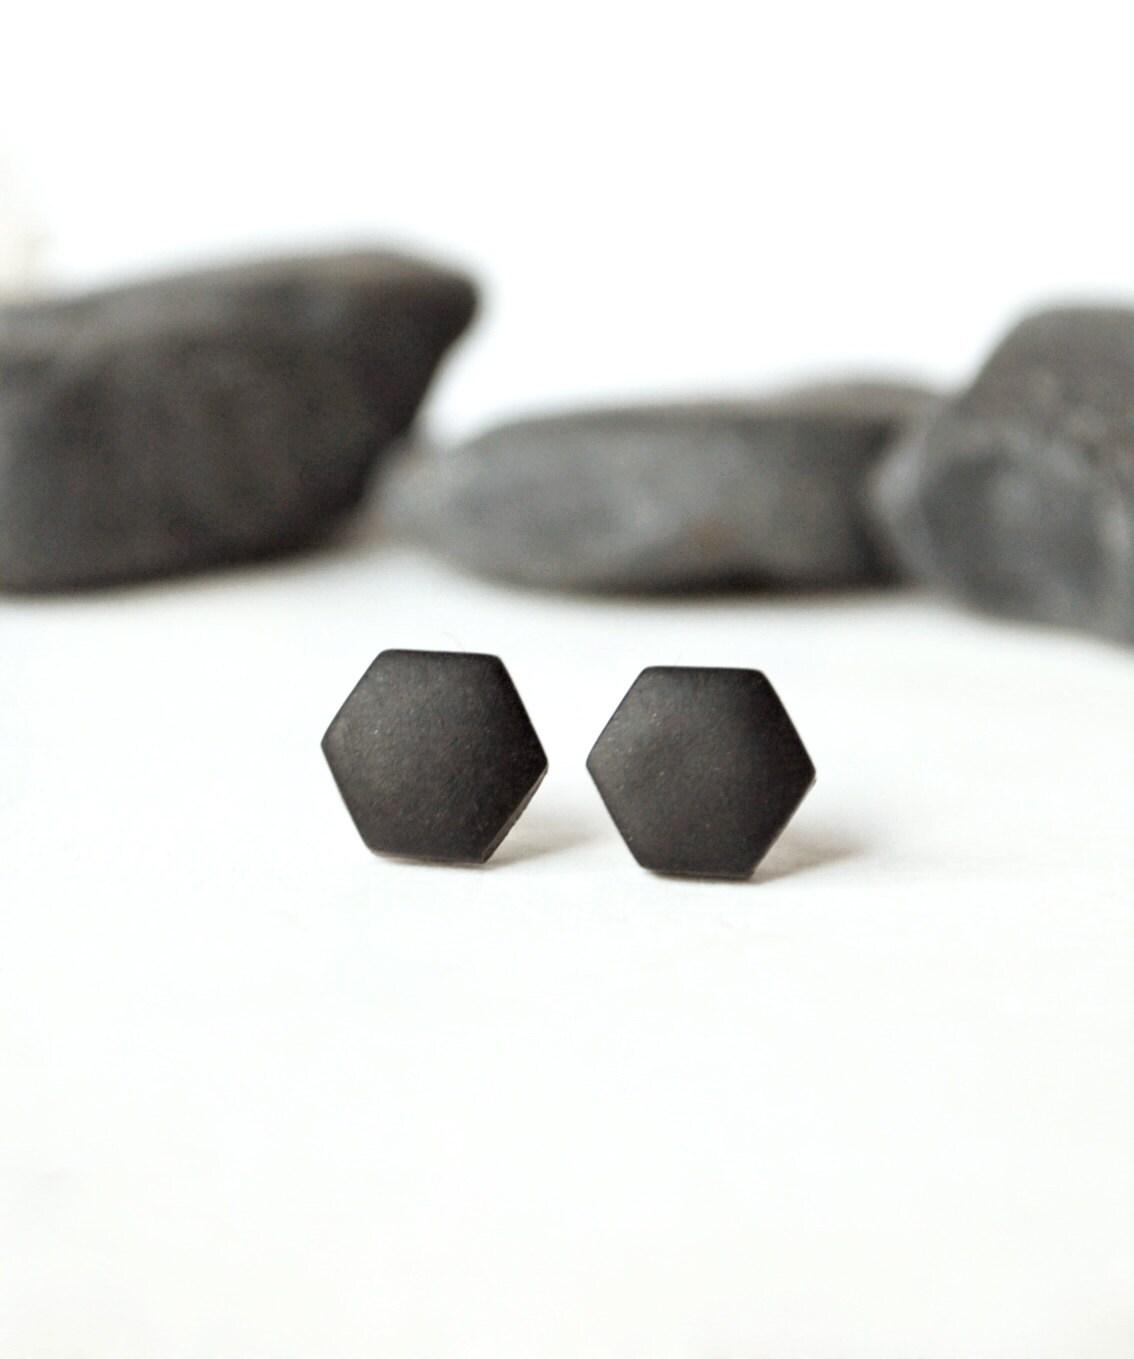 Black studs, matte black earrings, earrings for men, unisex, matte black studs, hexagon studs, black stud earring, mens earrings, mens studs